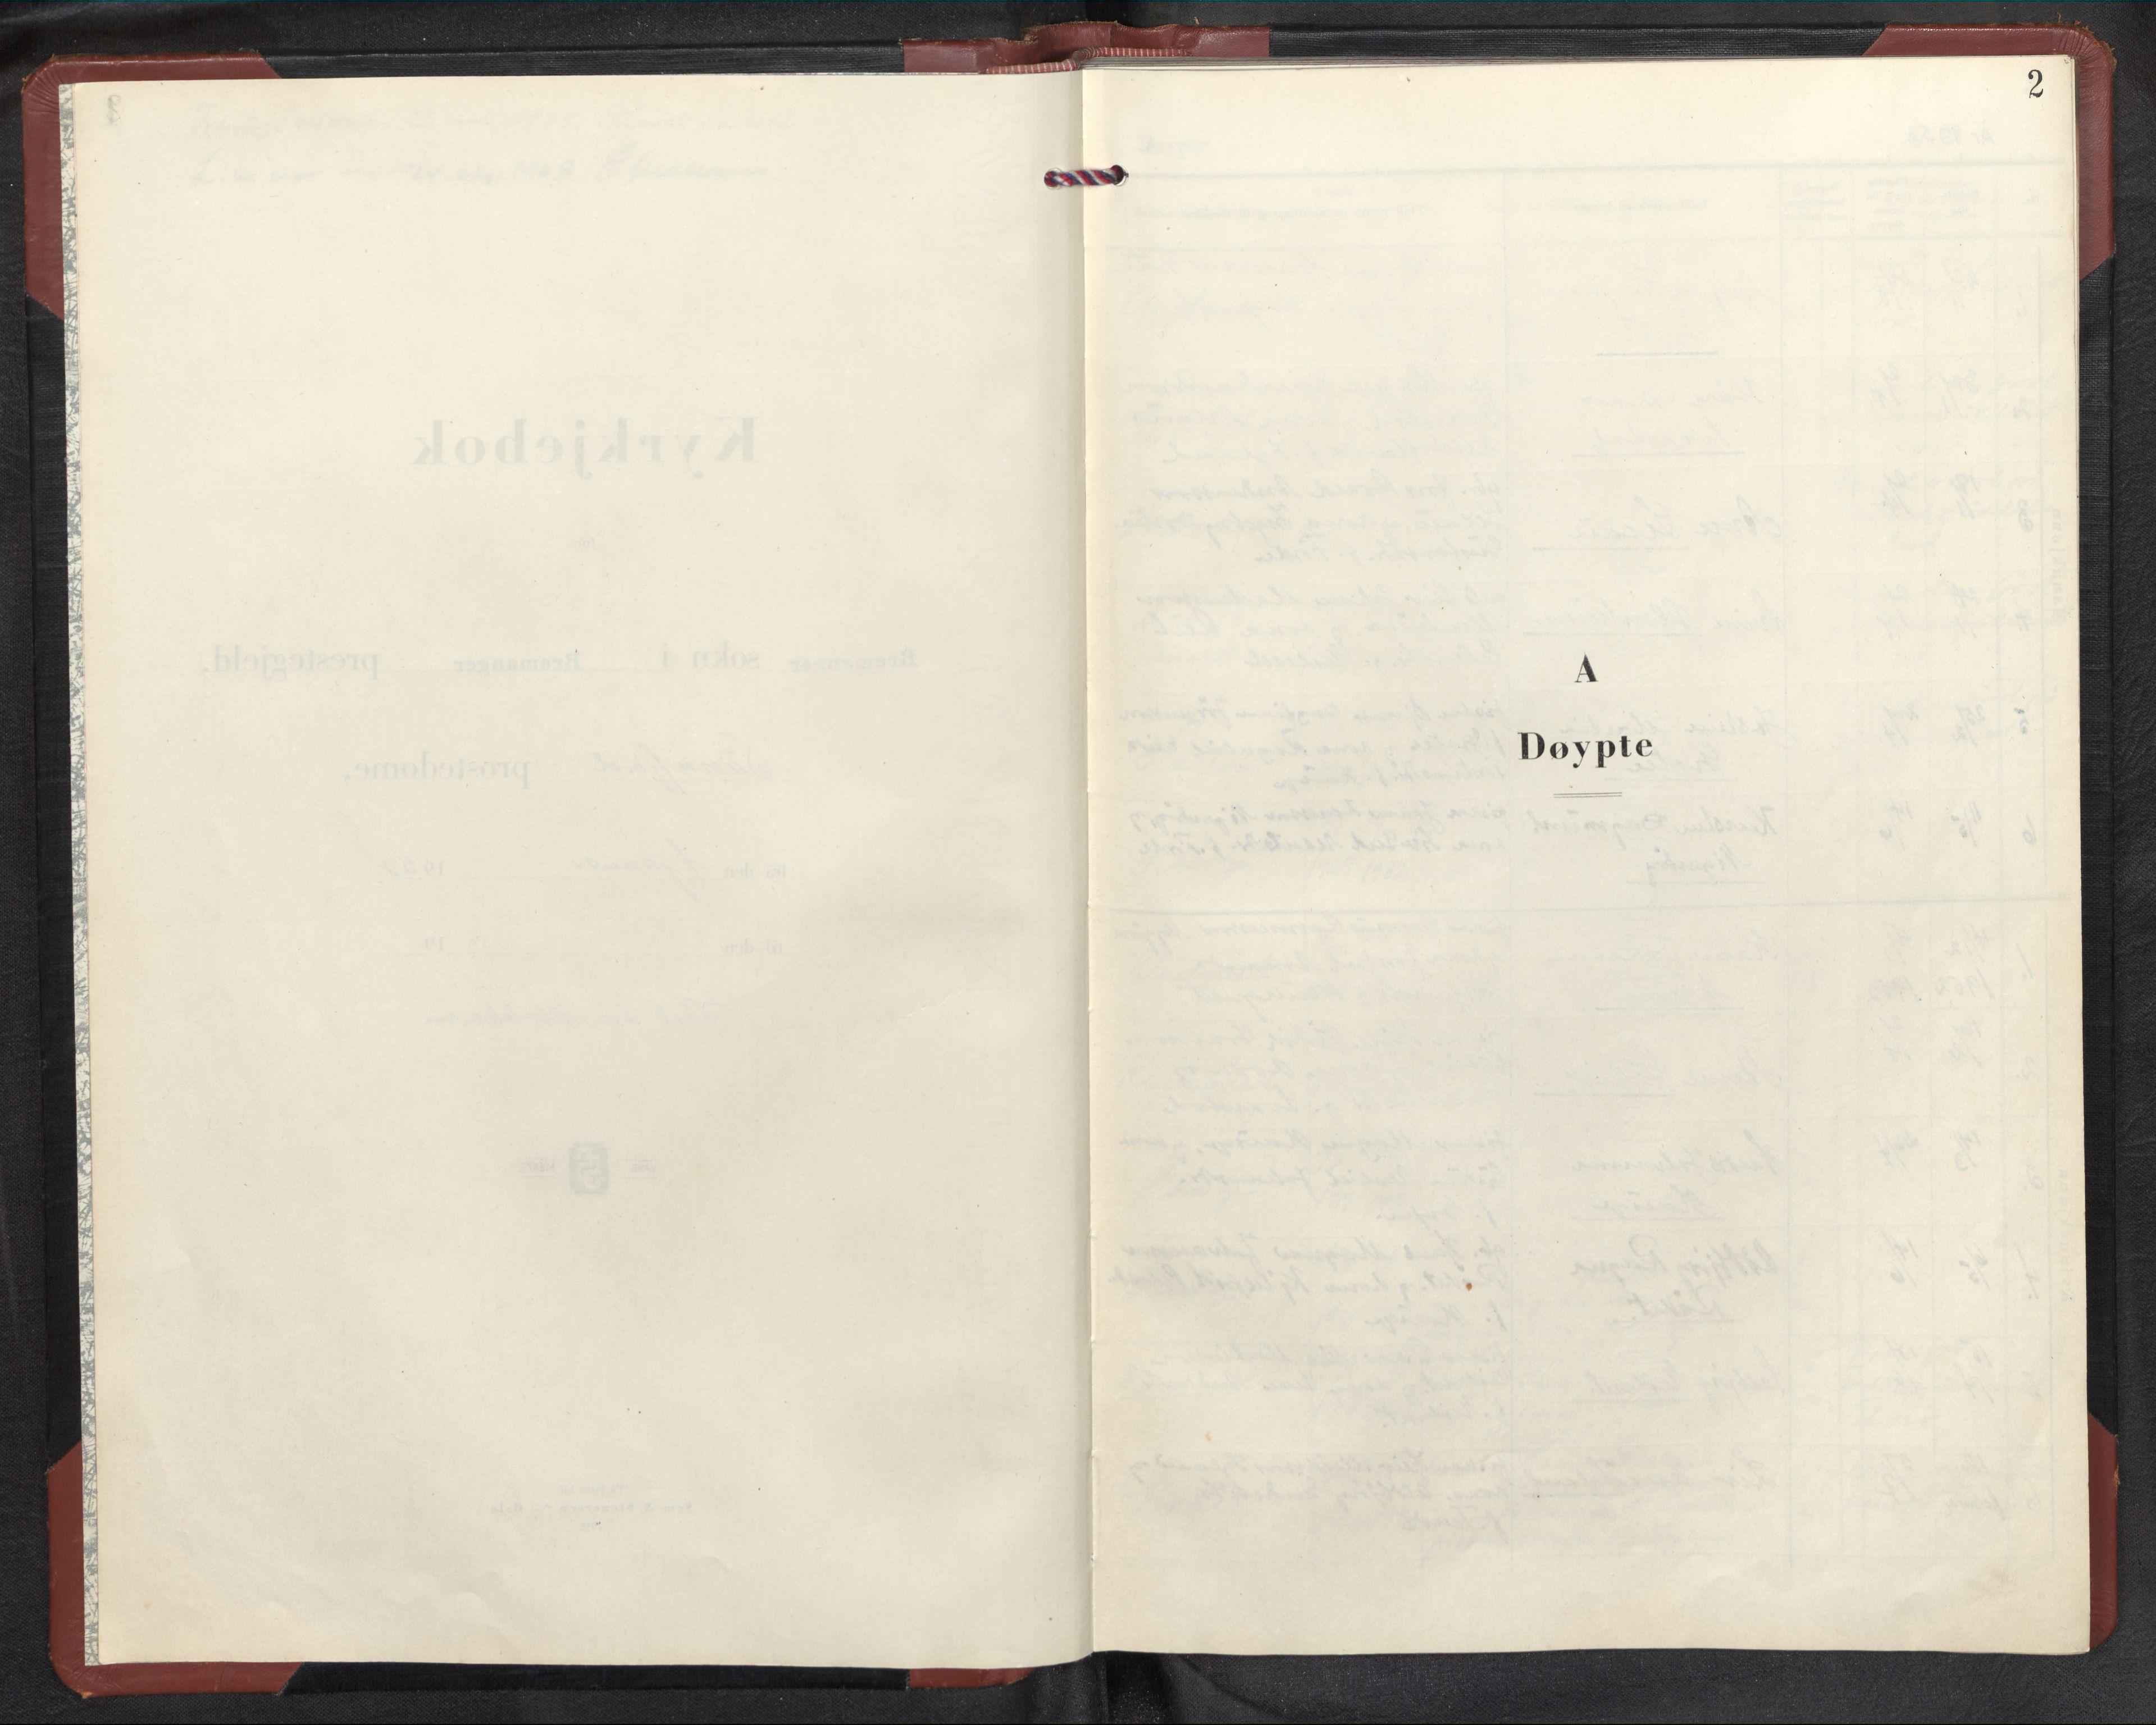 SAB, Bremanger Sokneprestembete, H/Hab: Klokkerbok nr. C 4, 1953-1970, s. 1b-2a